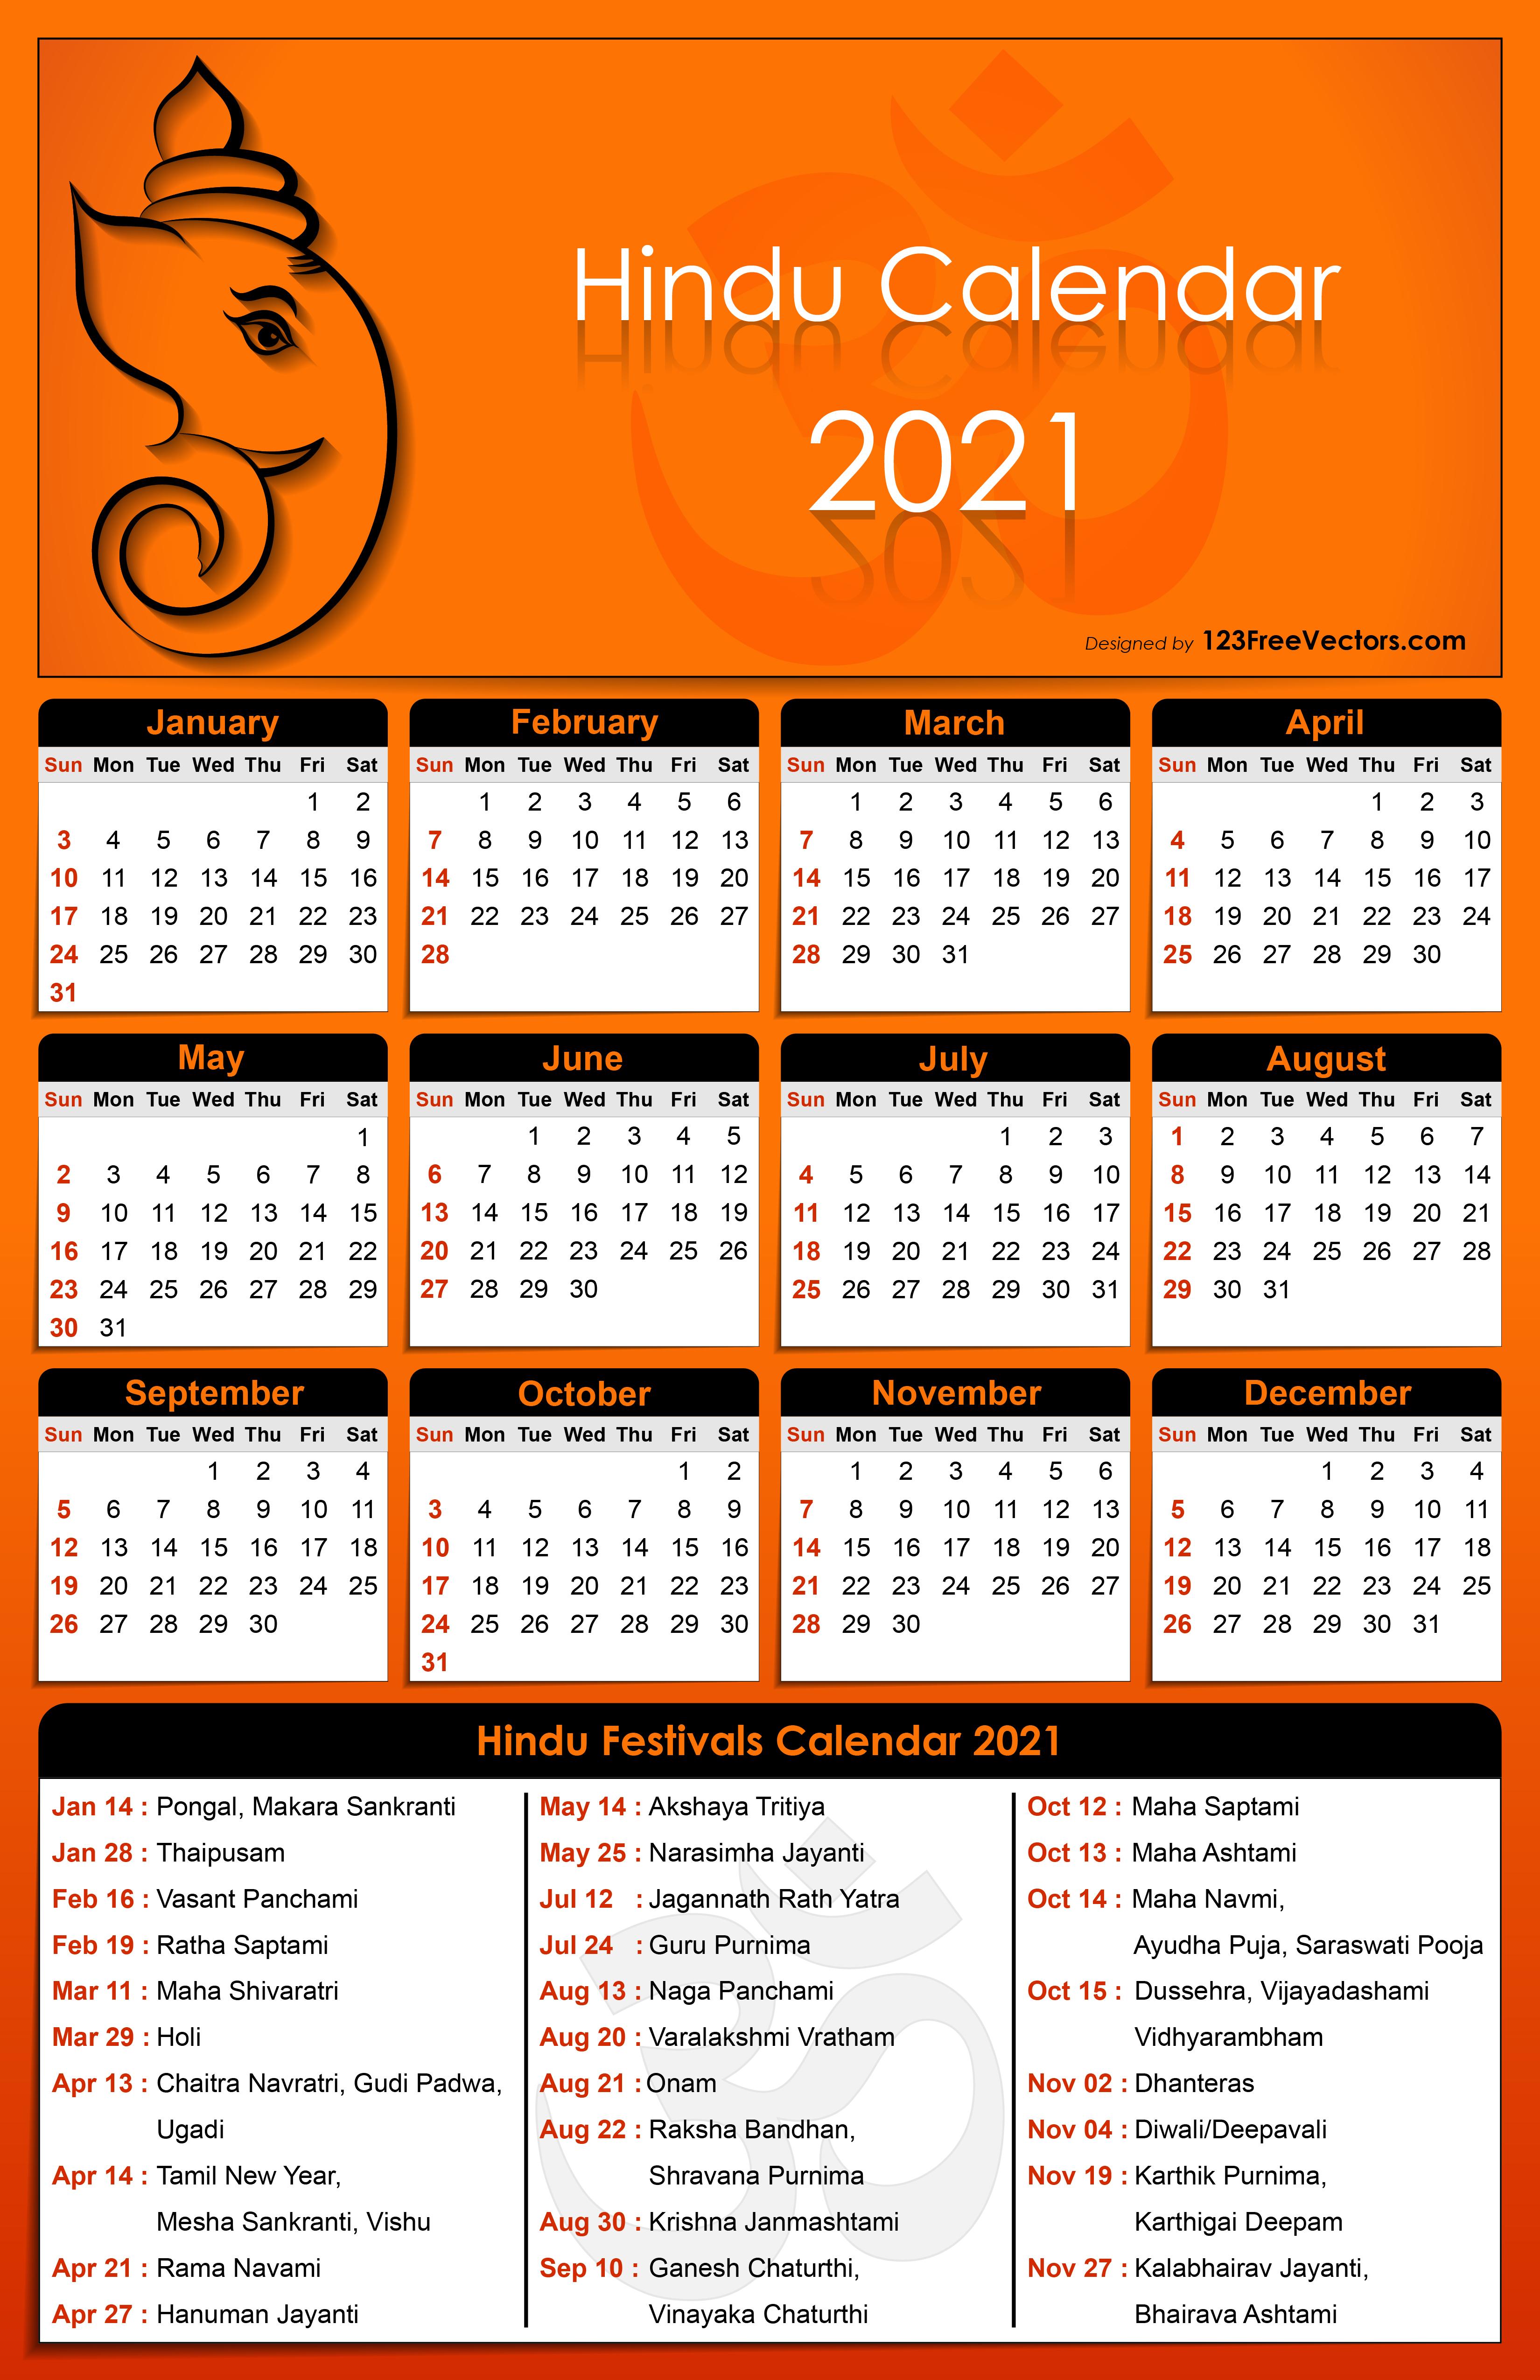 Images of Festival Calendar 2021